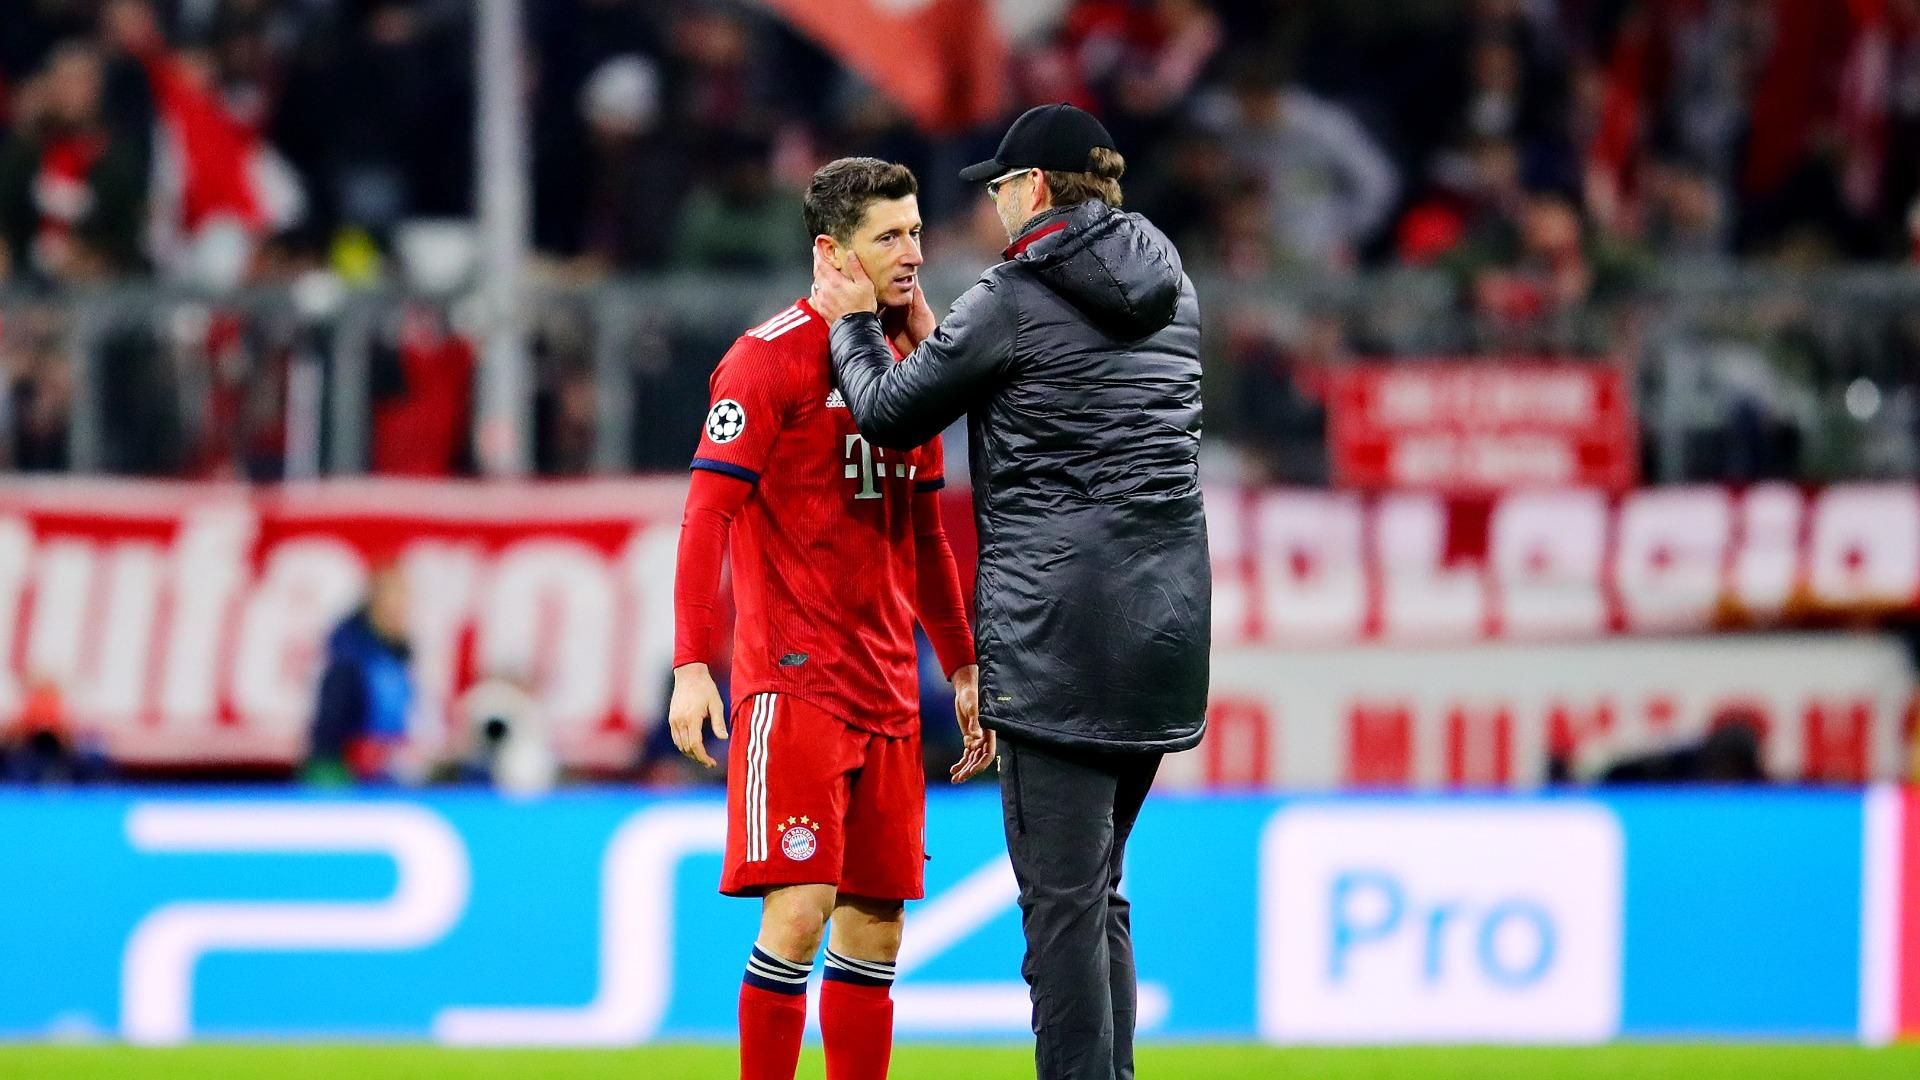 Lewandowski pays tribute to 'genius' Klopp